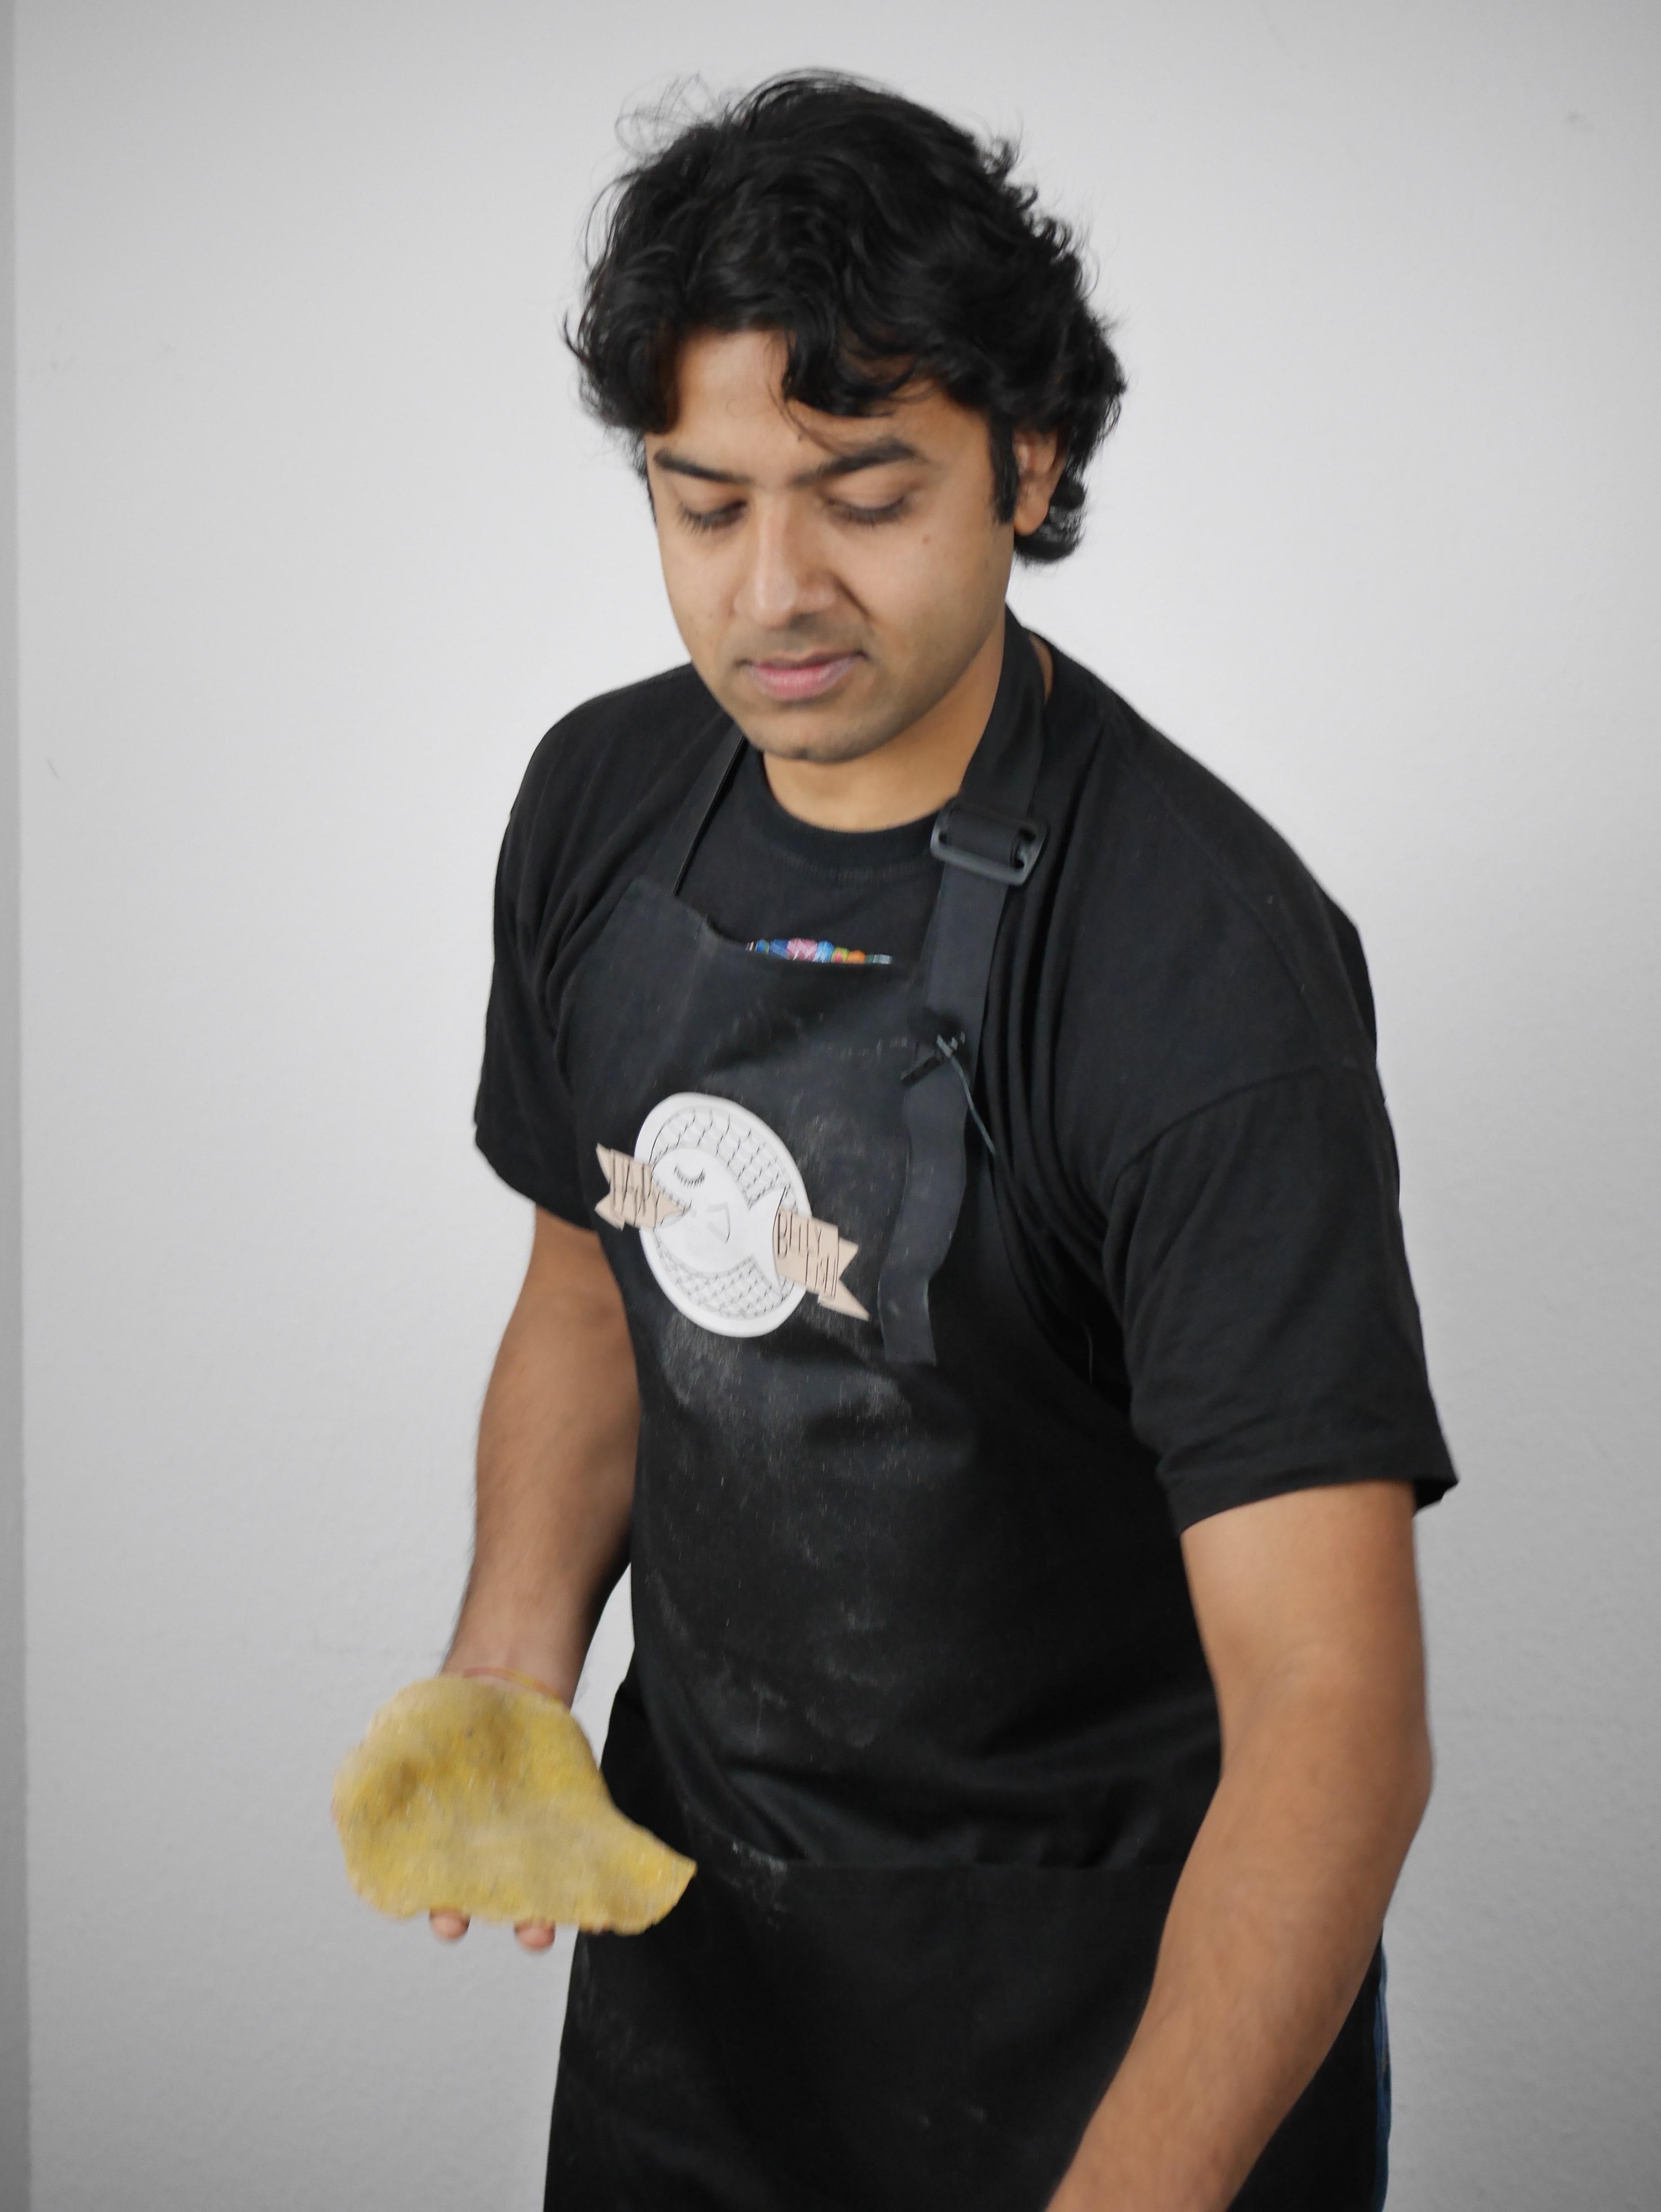 Srikant Singh